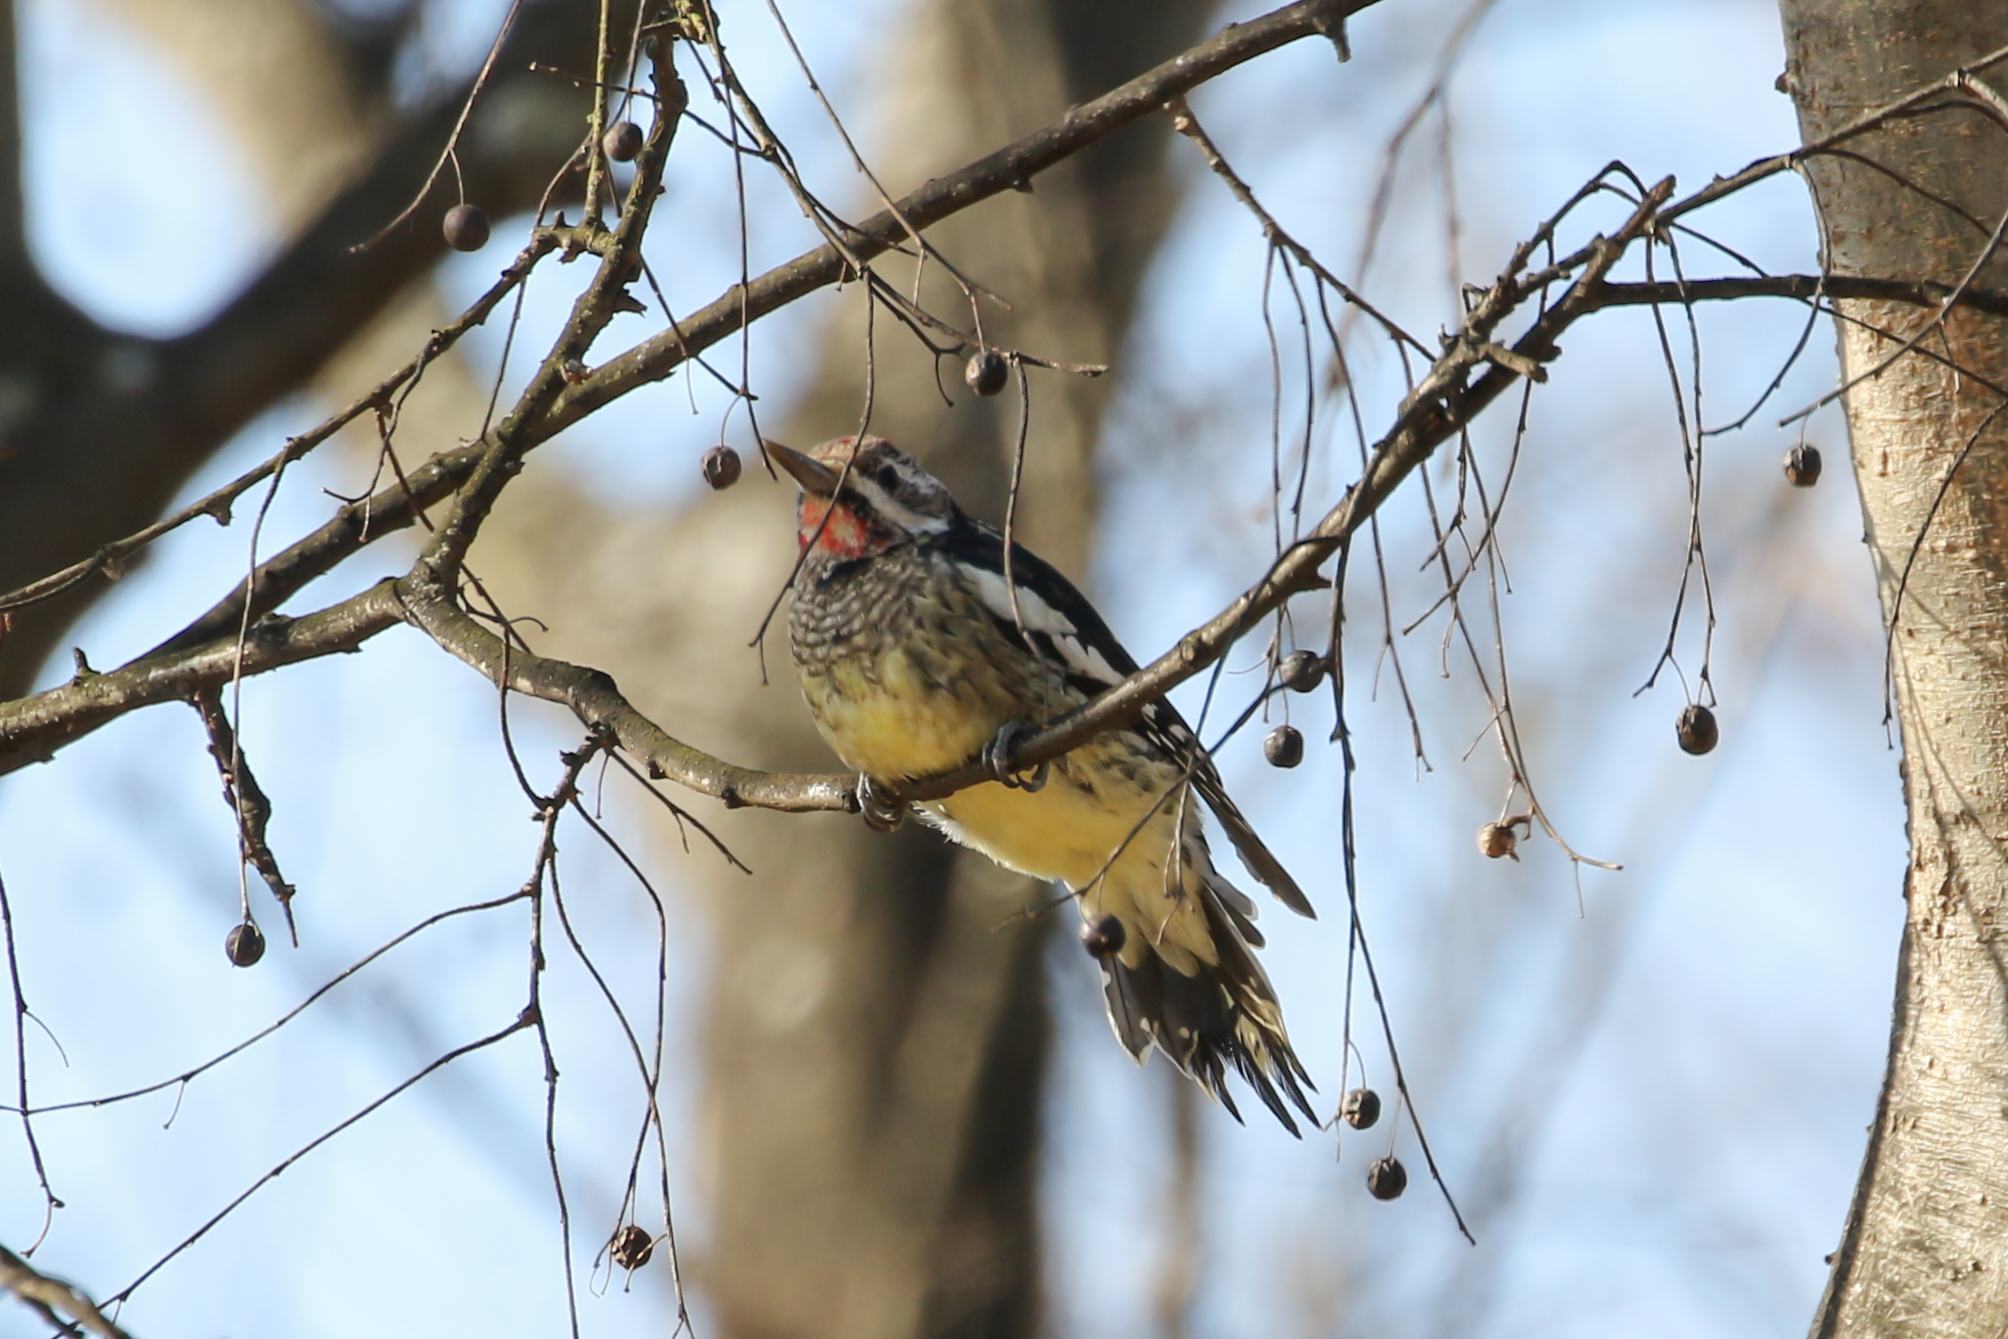 Yellow-bellied Sapsucker, immature male